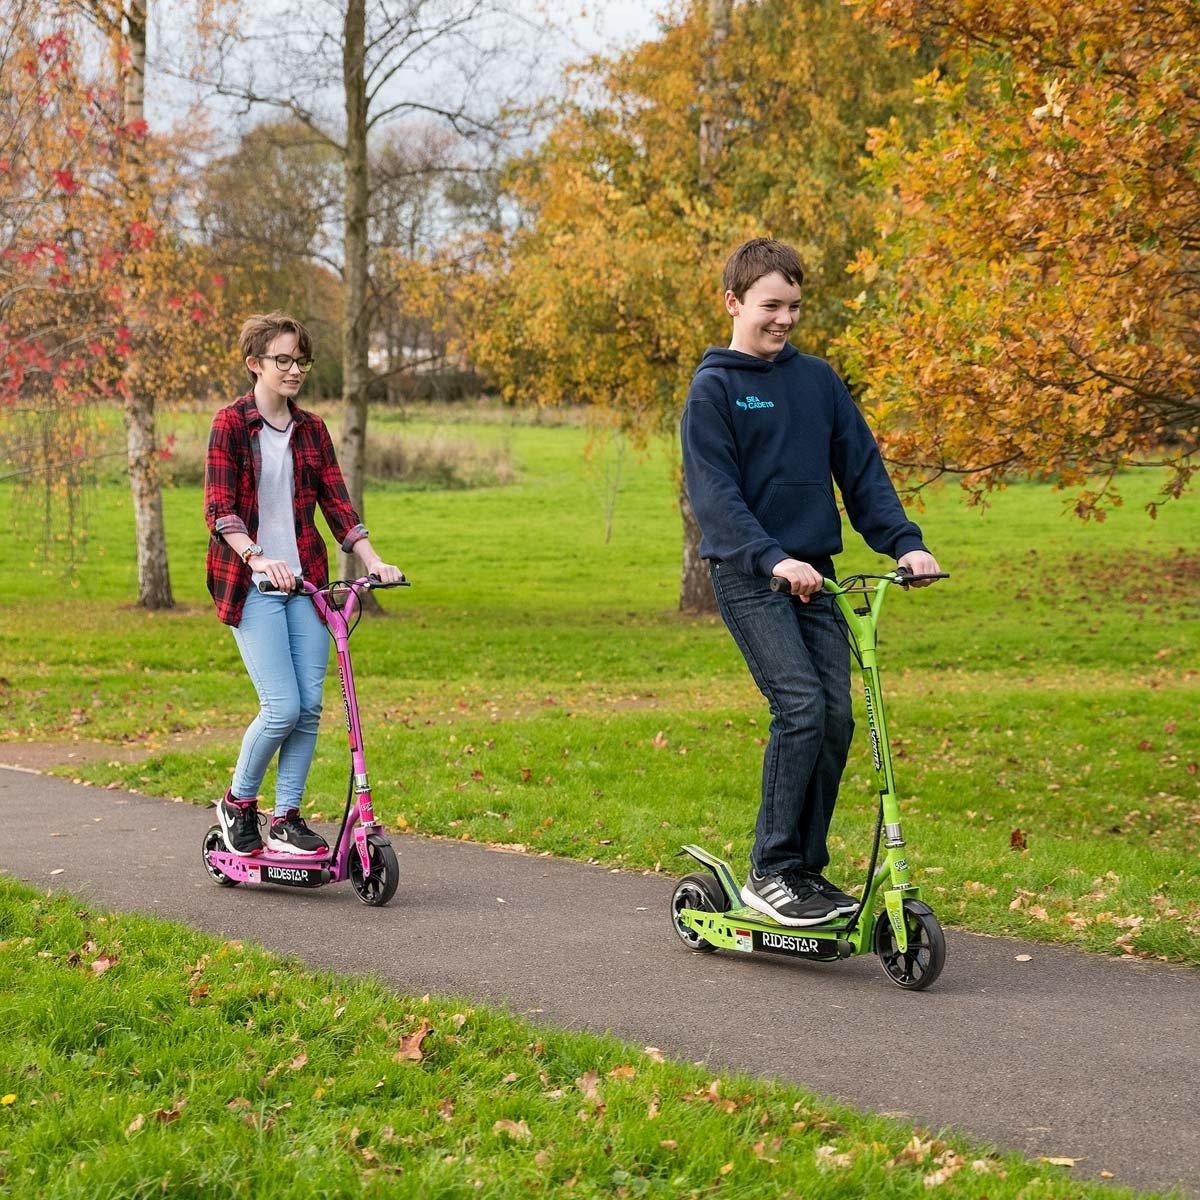 RideStar Patinete eléctrico plegable para niños, motorizado ...